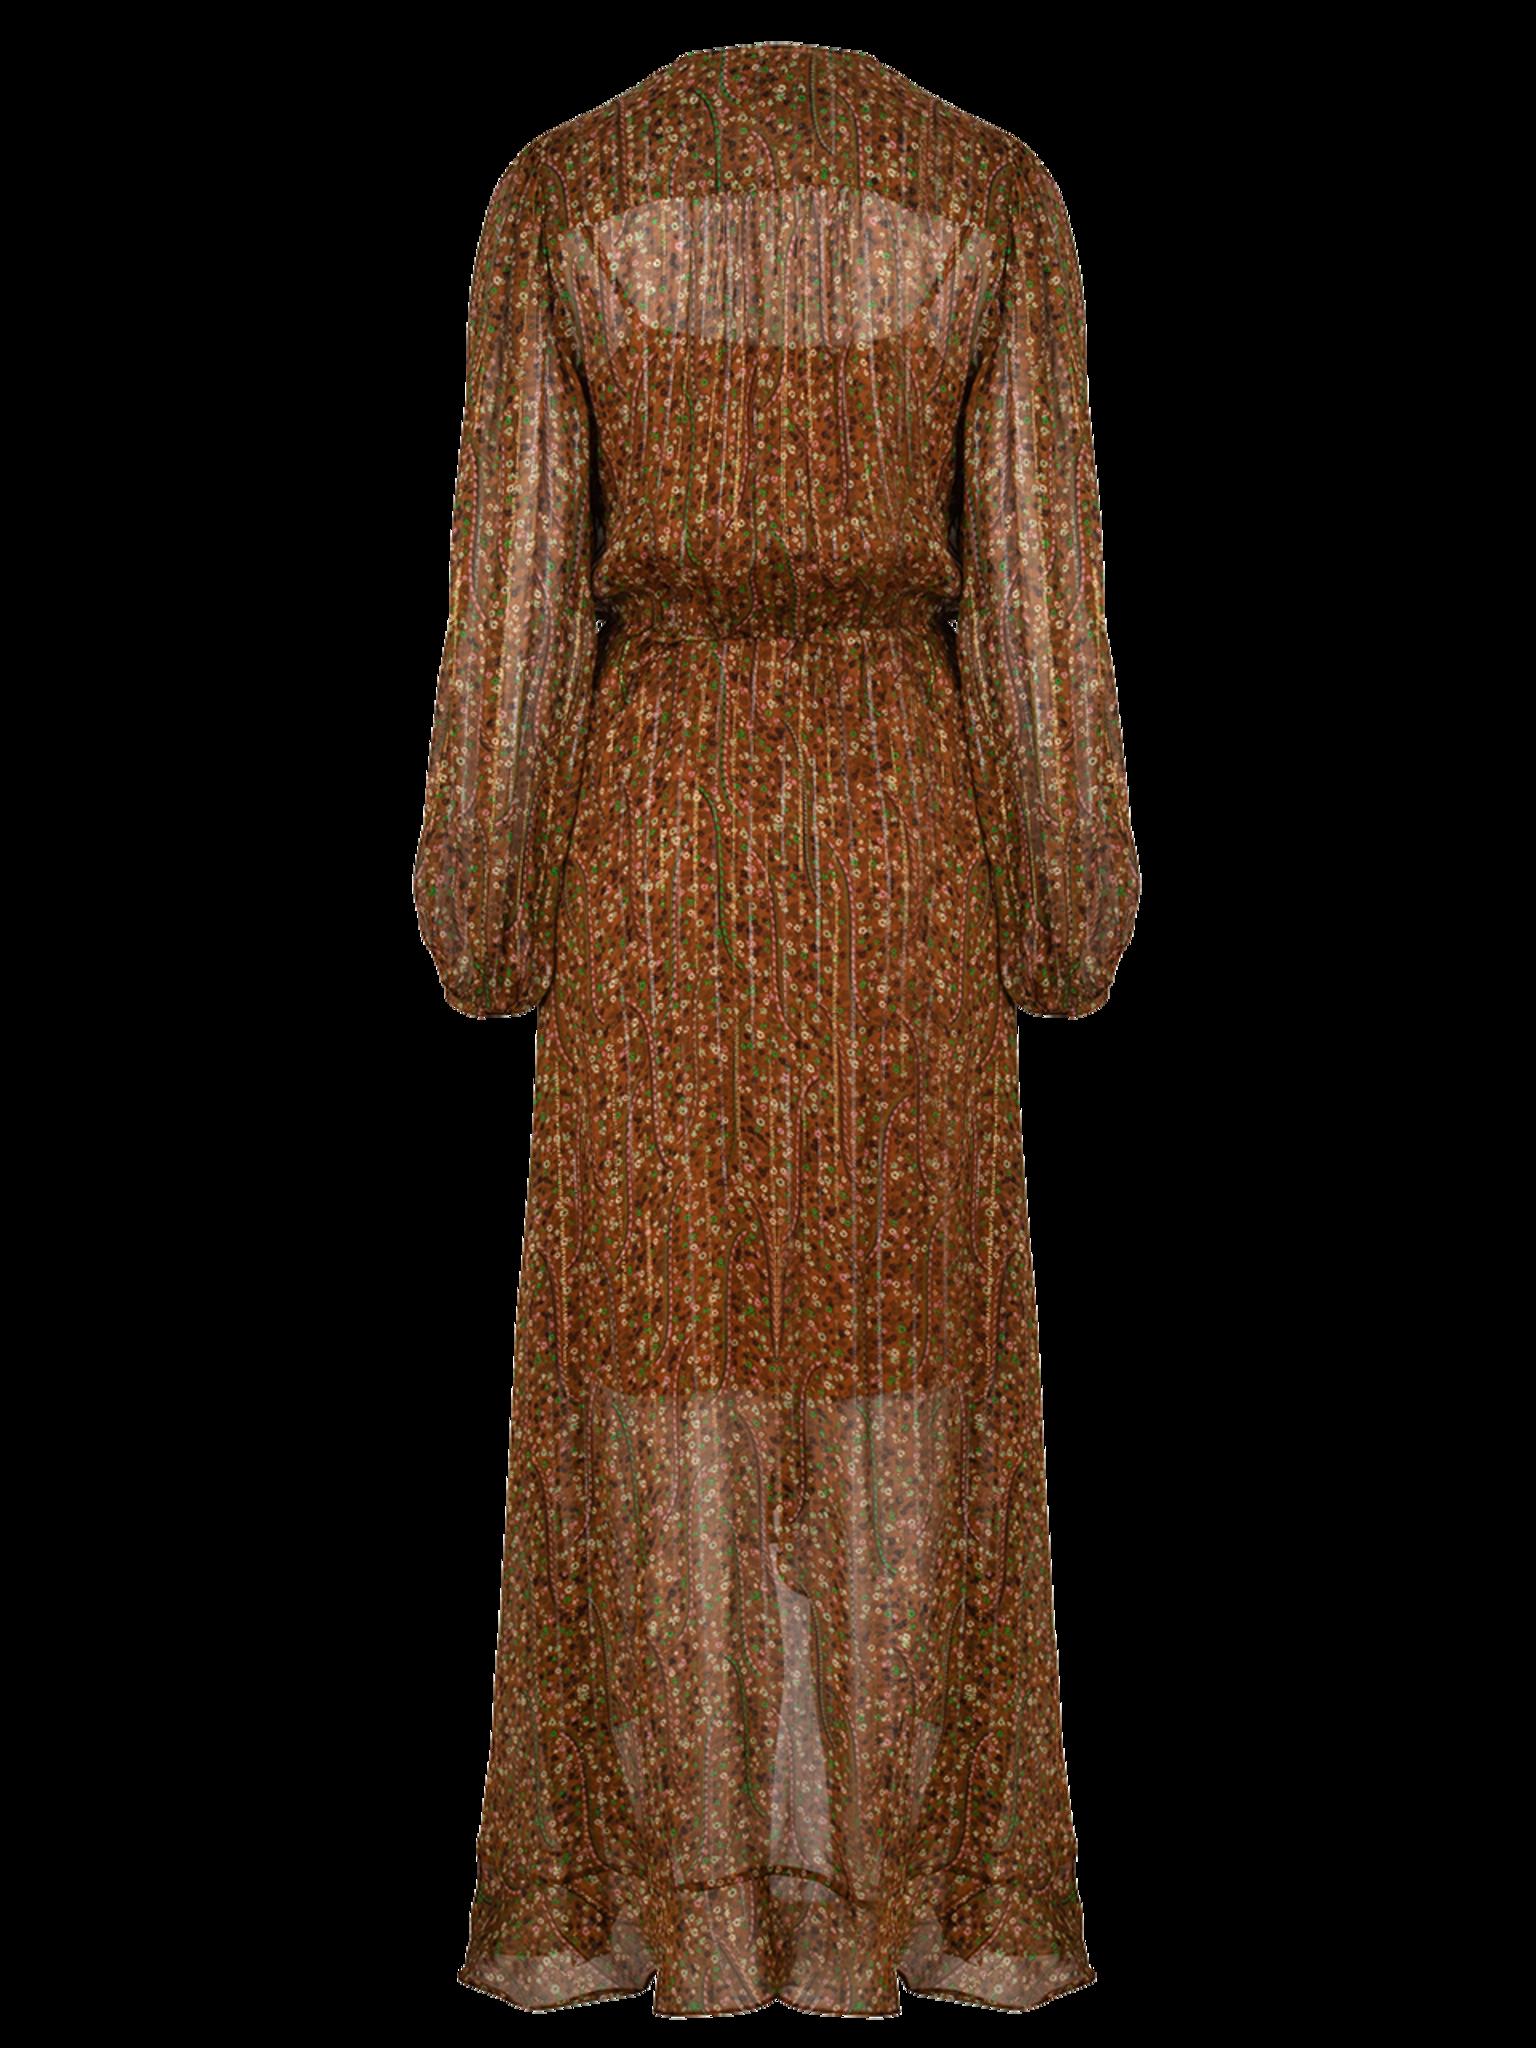 Dante 6 dress 211120 FLIRTY-2